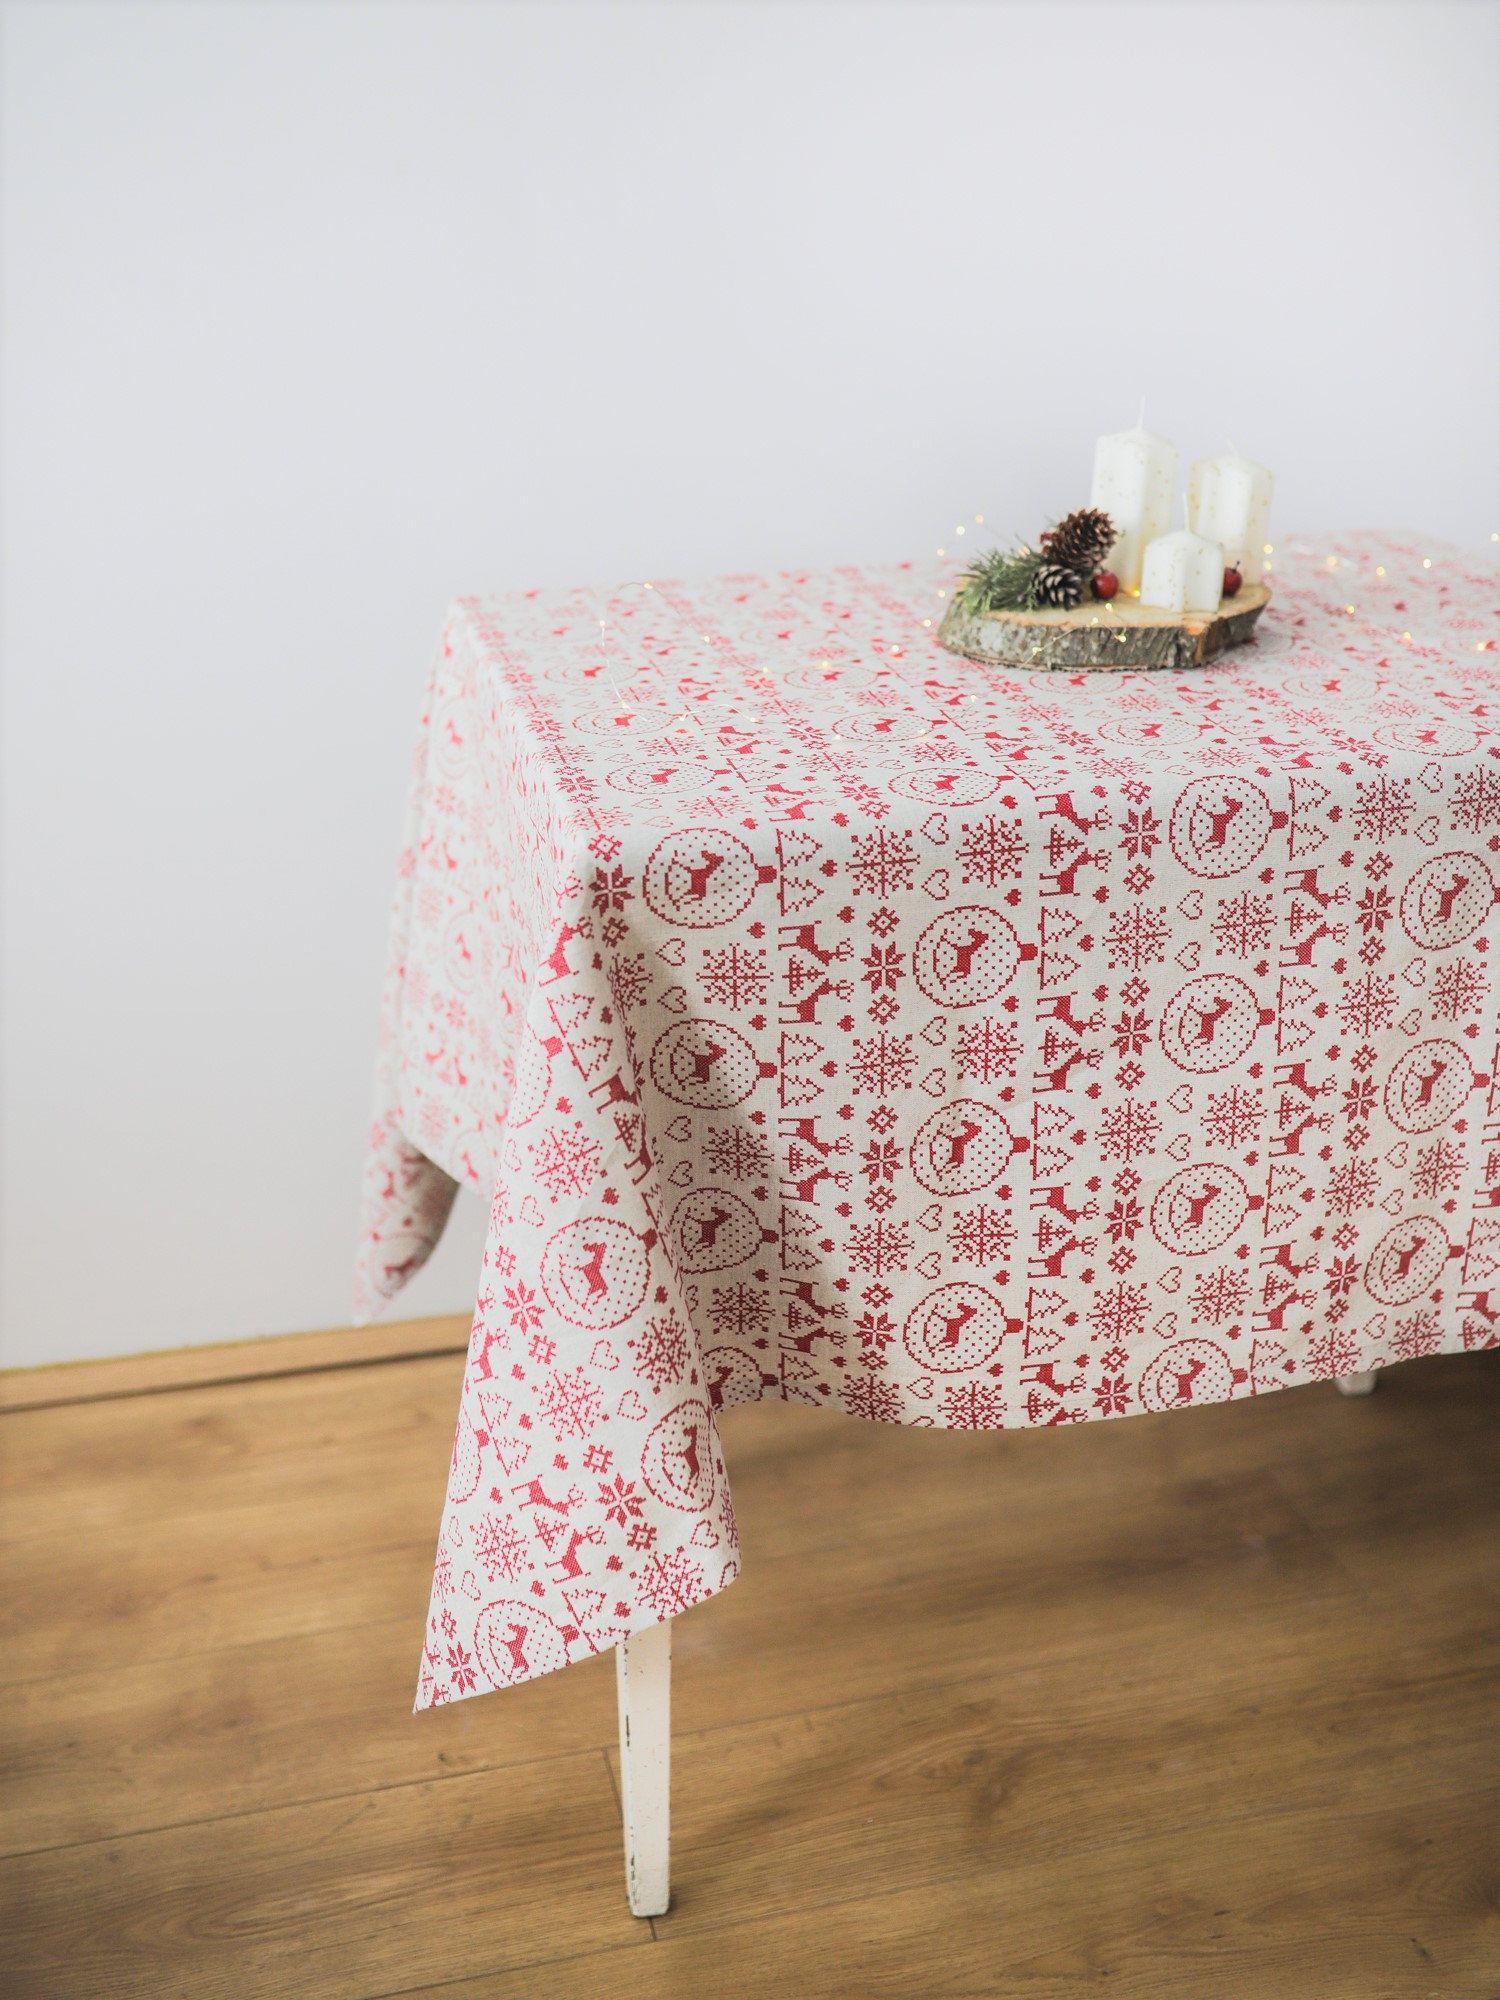 Christmas Accent Tablecloth Christmas Ornaments Table Cloth